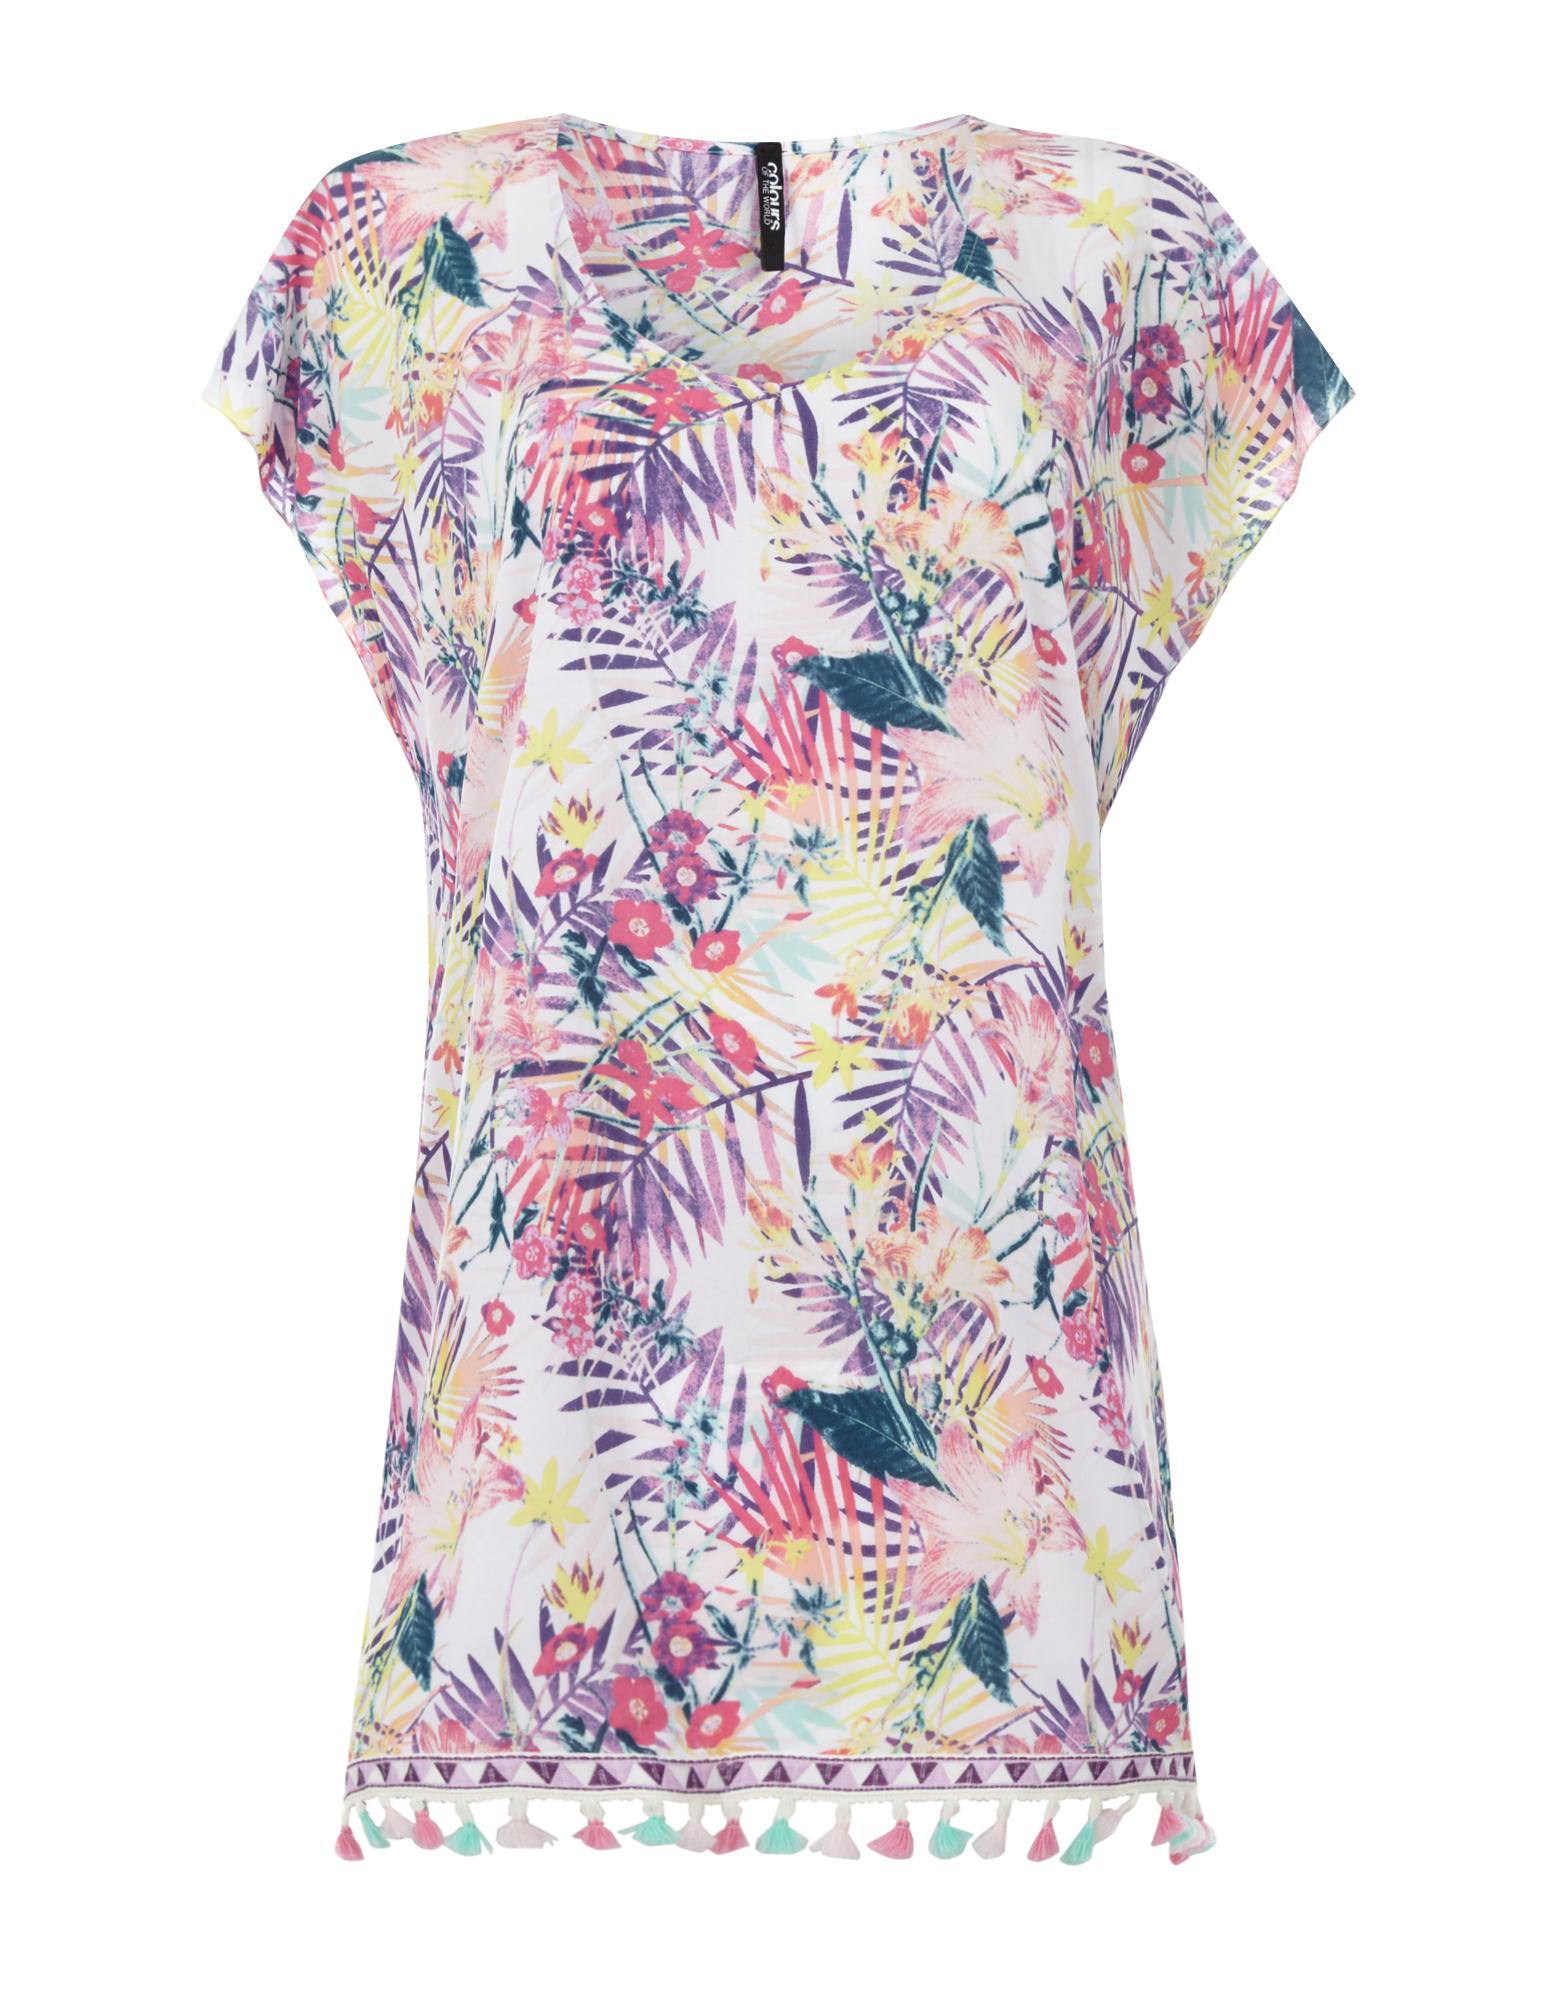 Damen Tunika mit Blumen-Print | Bekleidung > Tuniken > Sonstige Tuniken | Colours of the World